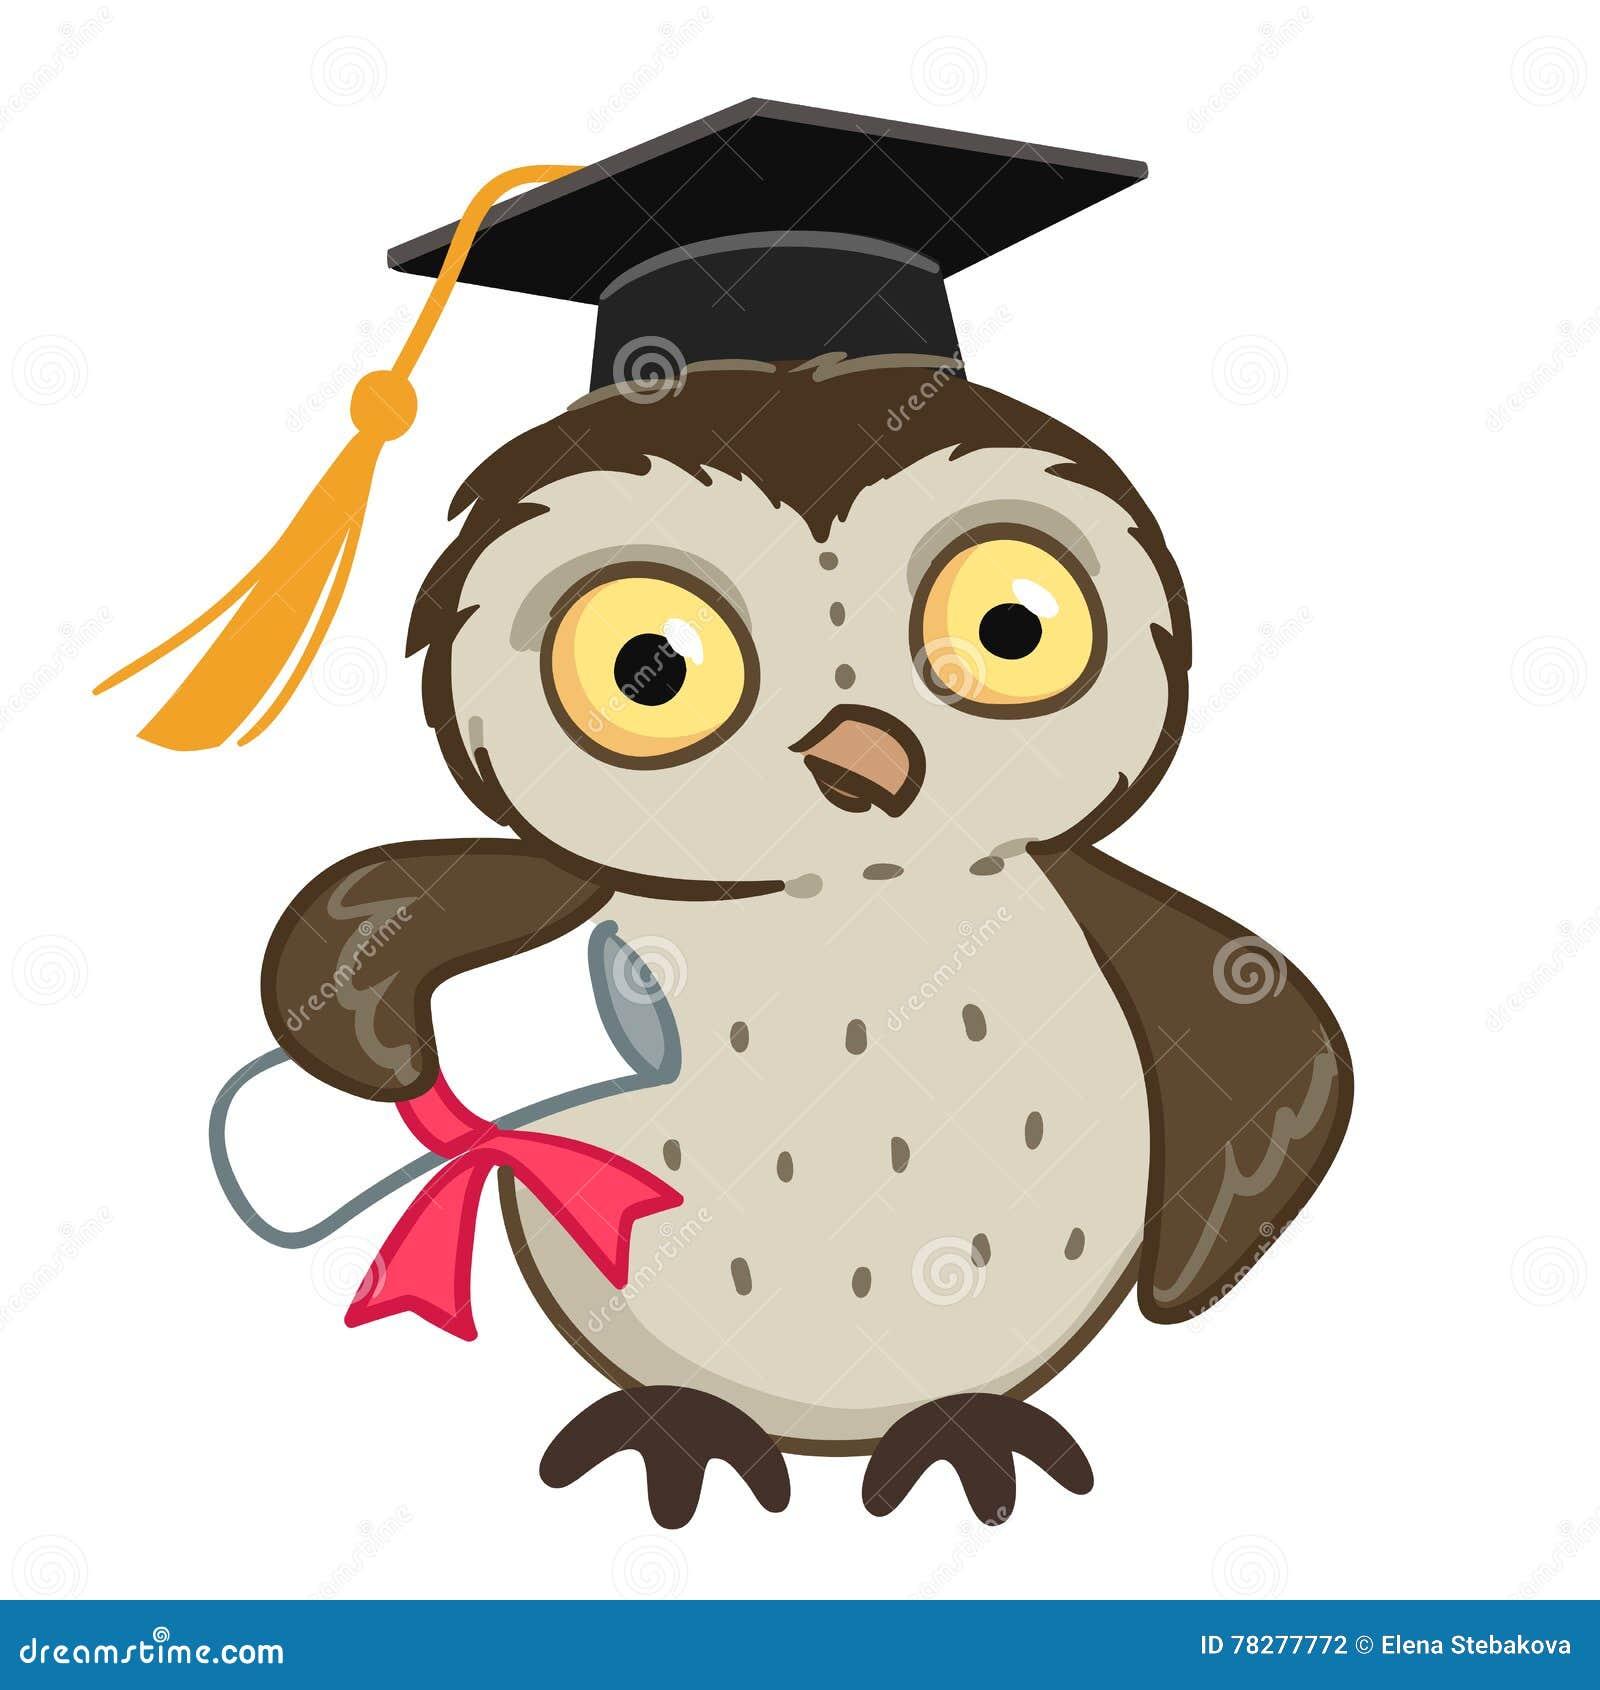 Vector hand drawn cartoon character mascot illustration of a cute owl  wearing mortarboard graduation cap 0e20b5b42d07